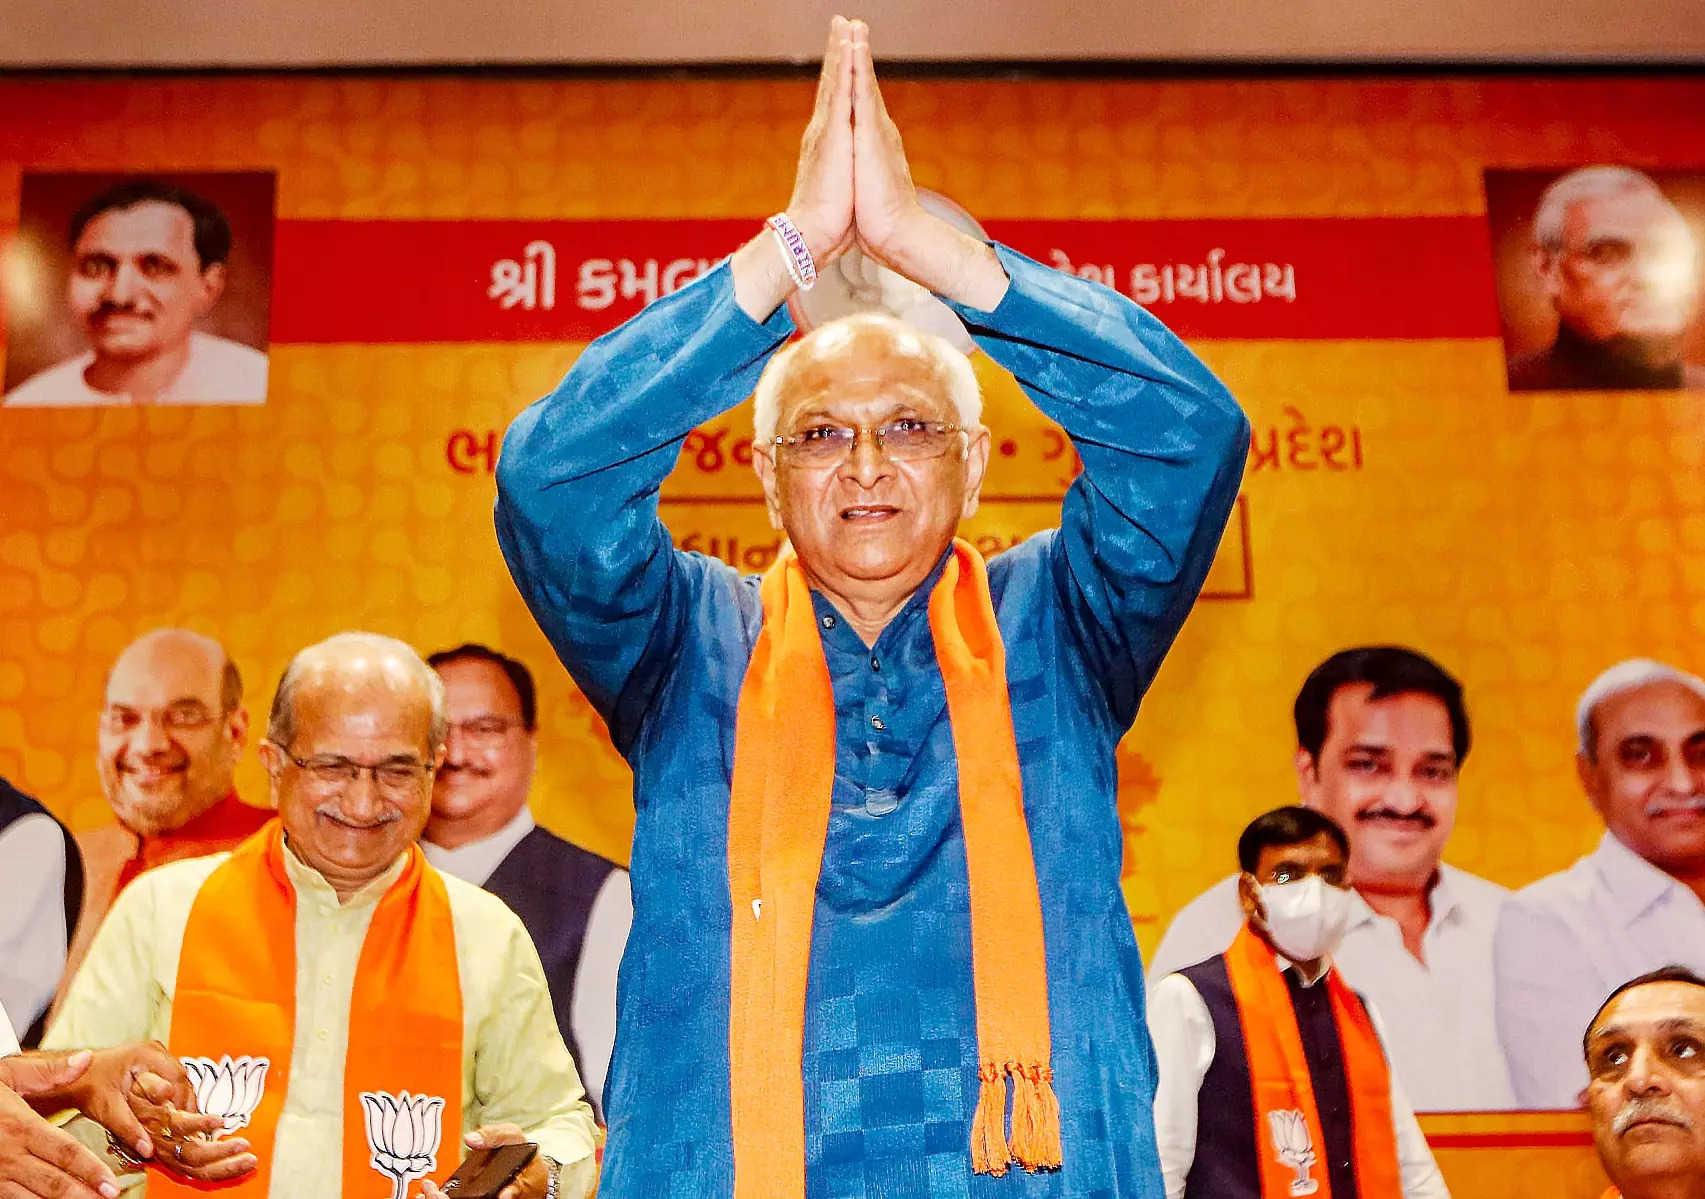 1. 'Wildcard' Bhupendra Patel is Gujarat's 17th CM